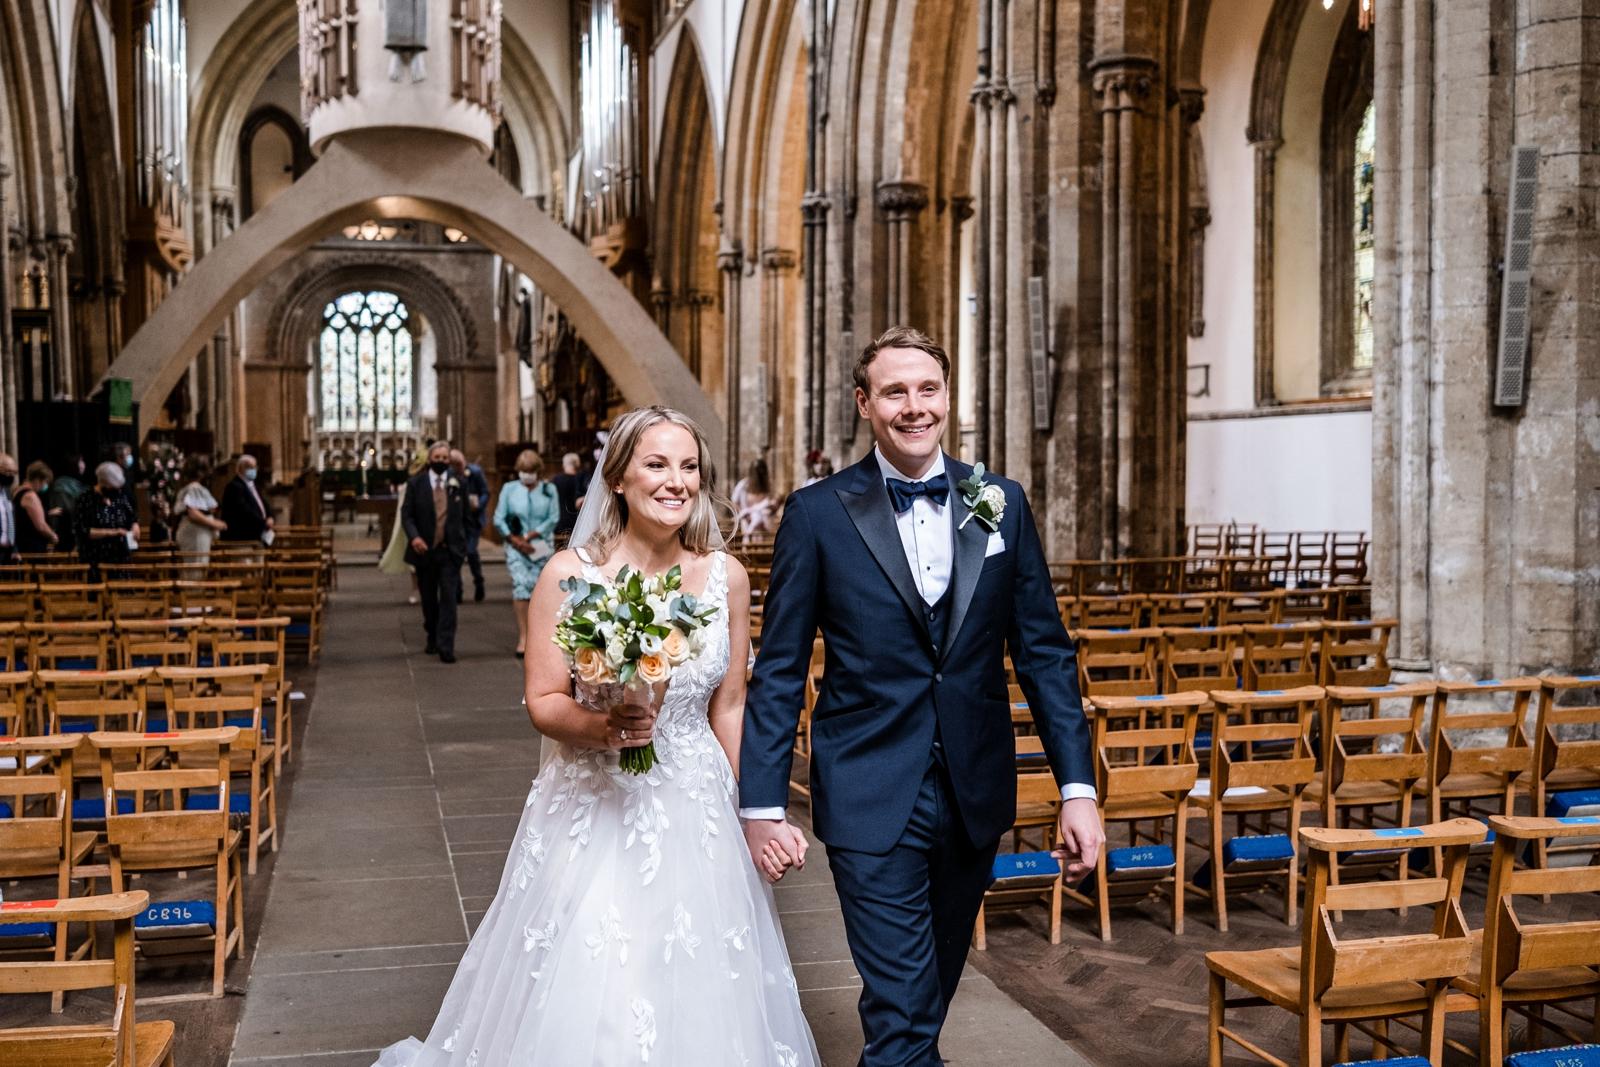 Bride and groom walking down the aisle at Llandaff Cathedral